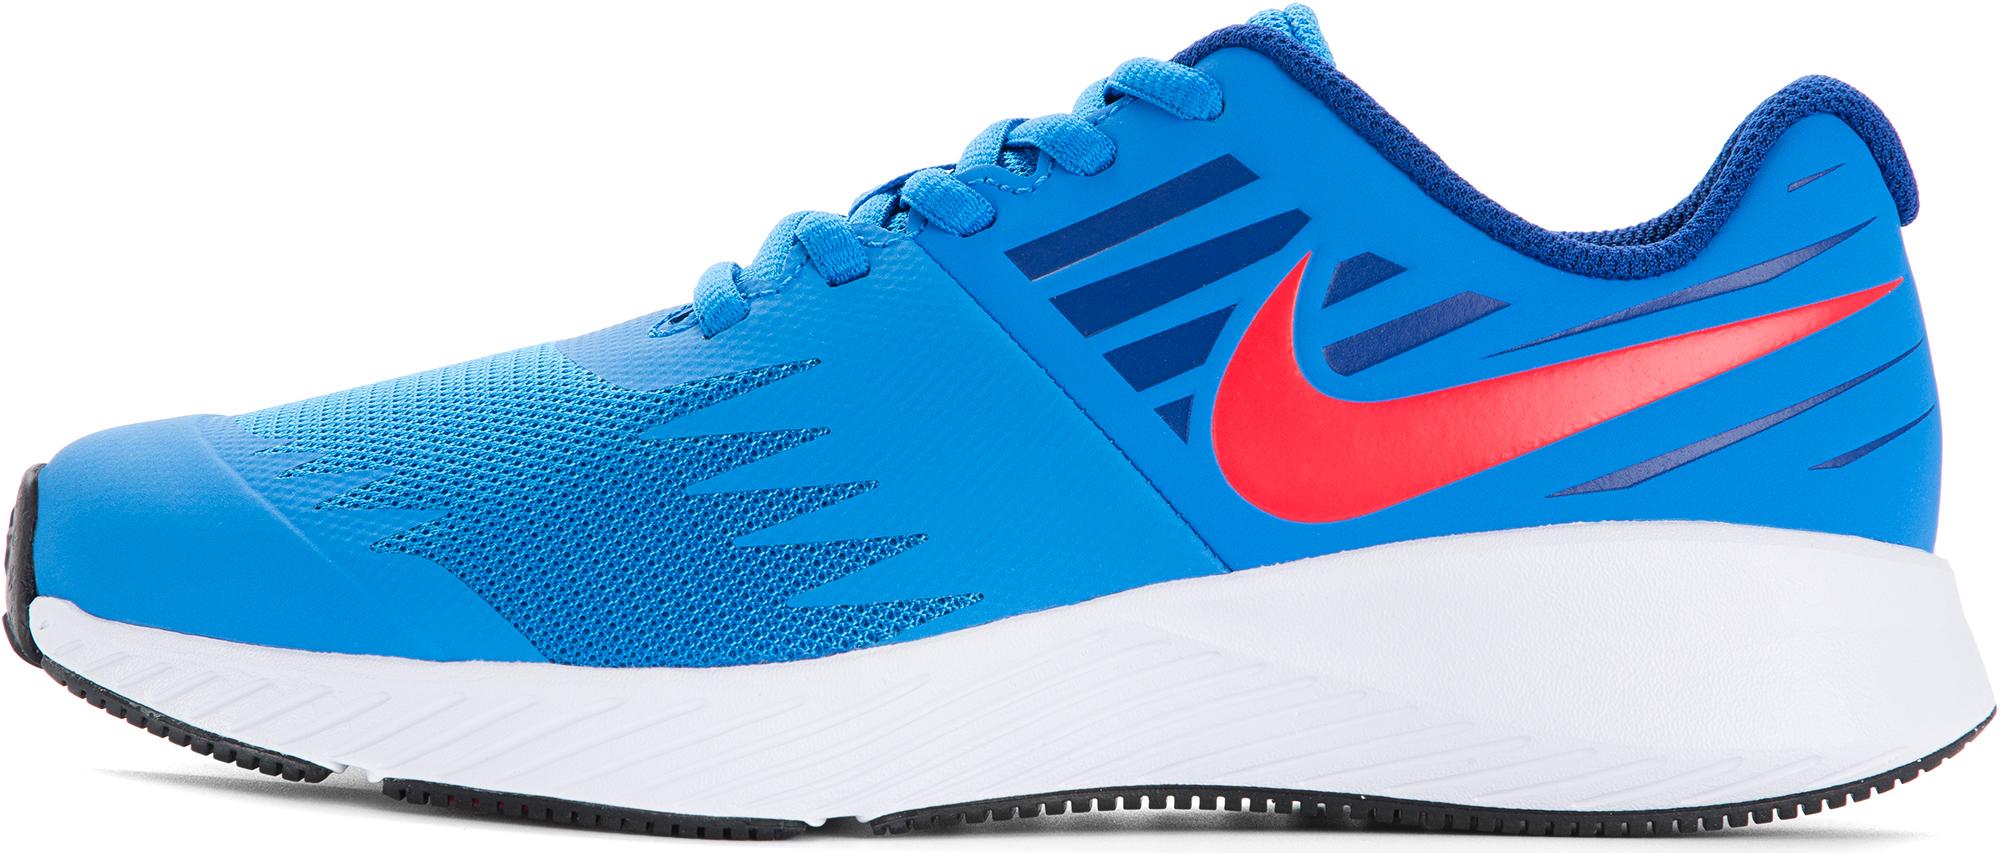 Nike Кроссовки для мальчиков Star Runner, размер 36,5